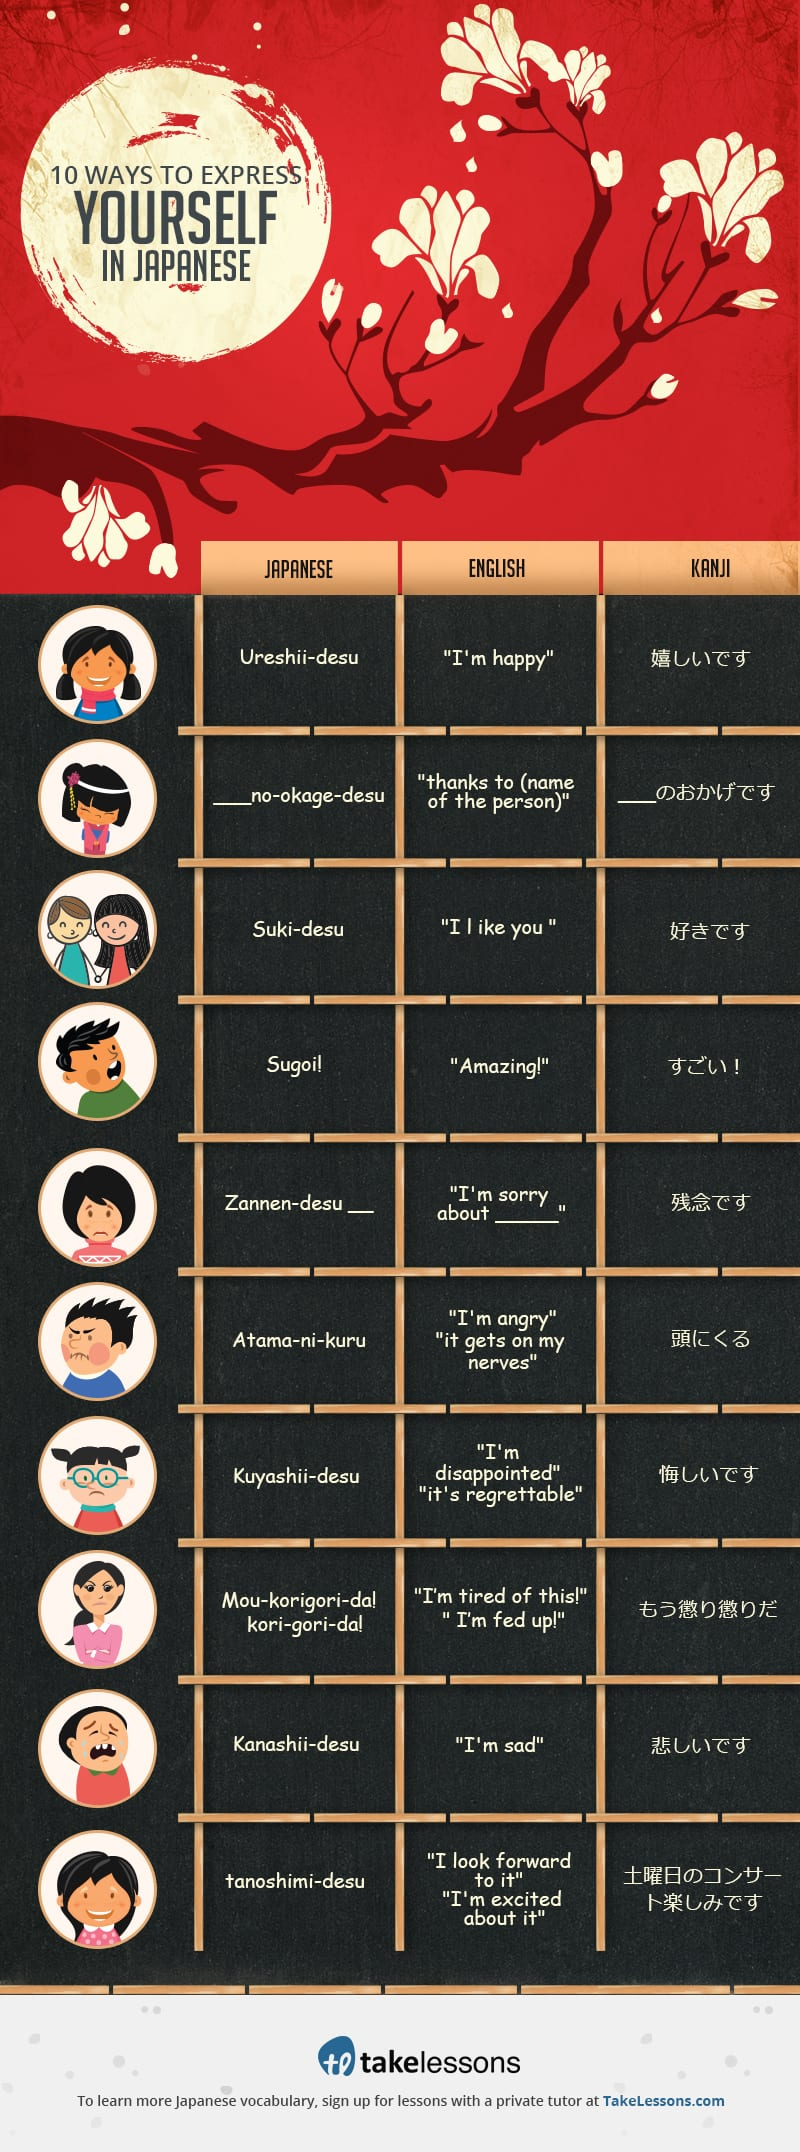 Japanese Vocabulary 10 Ways To Express Yourself